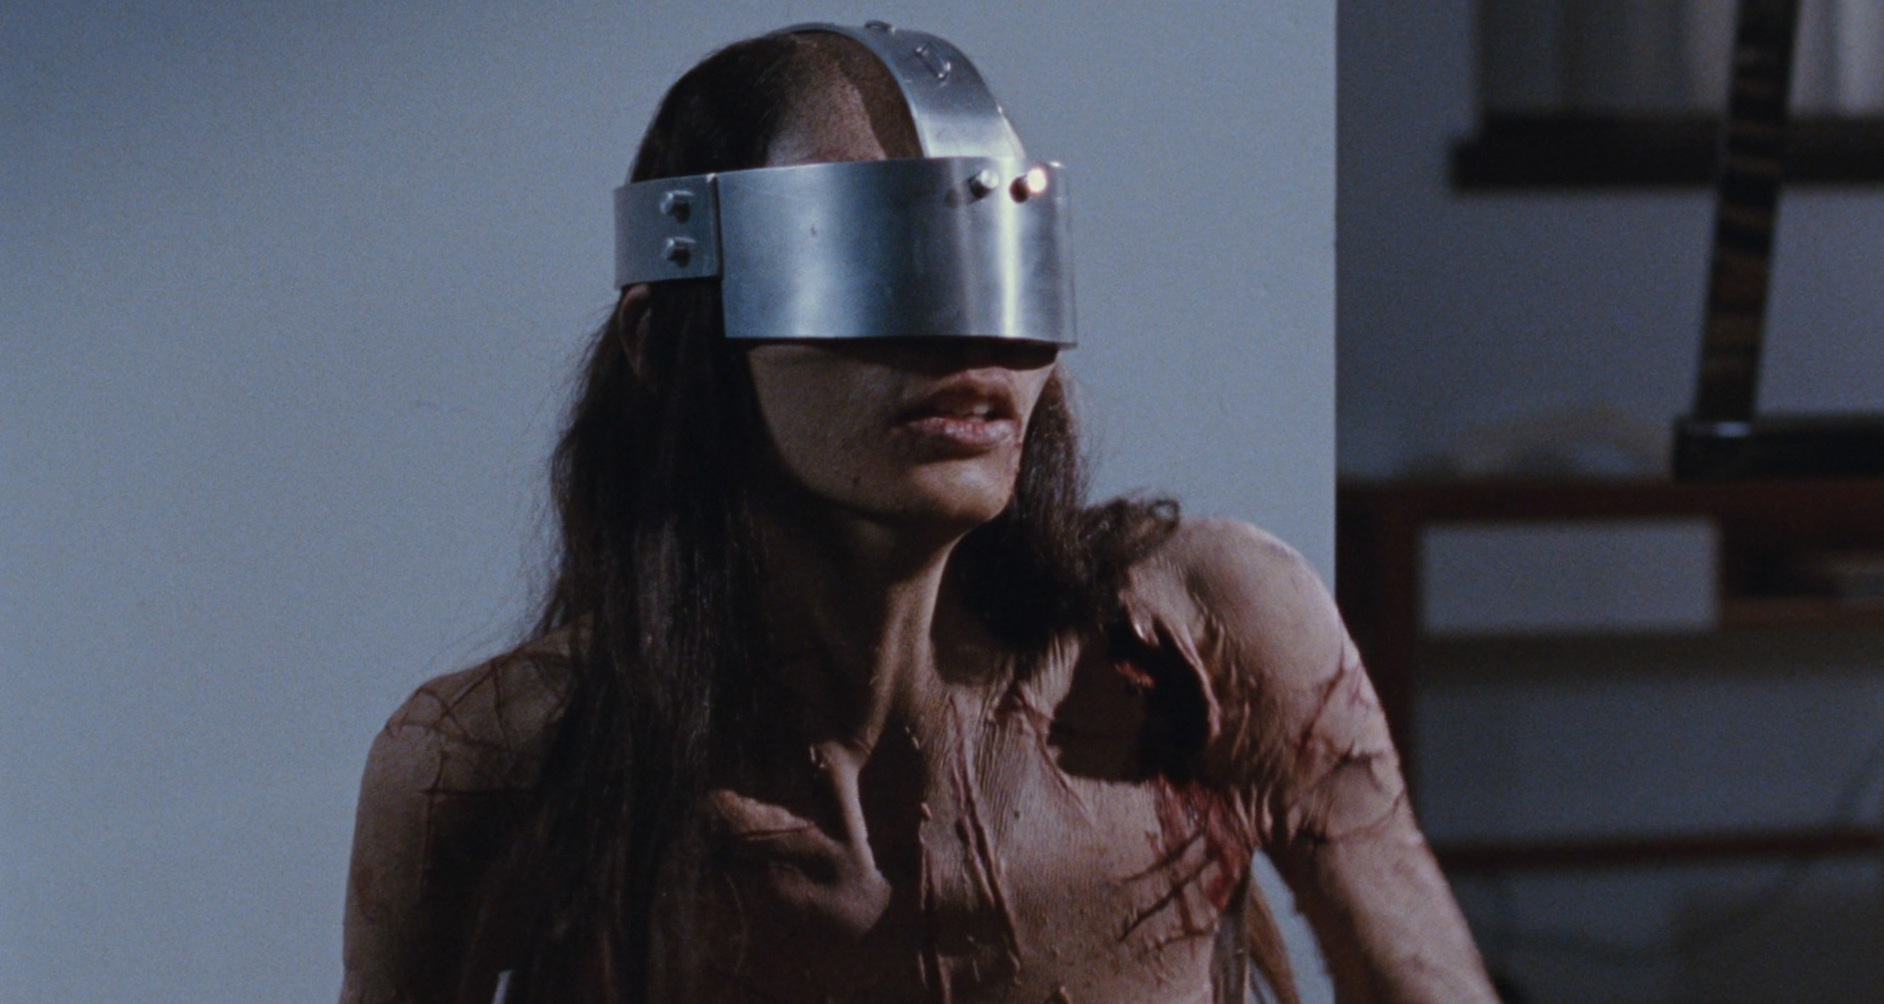 Woman skinned alive movie scene adult scenes